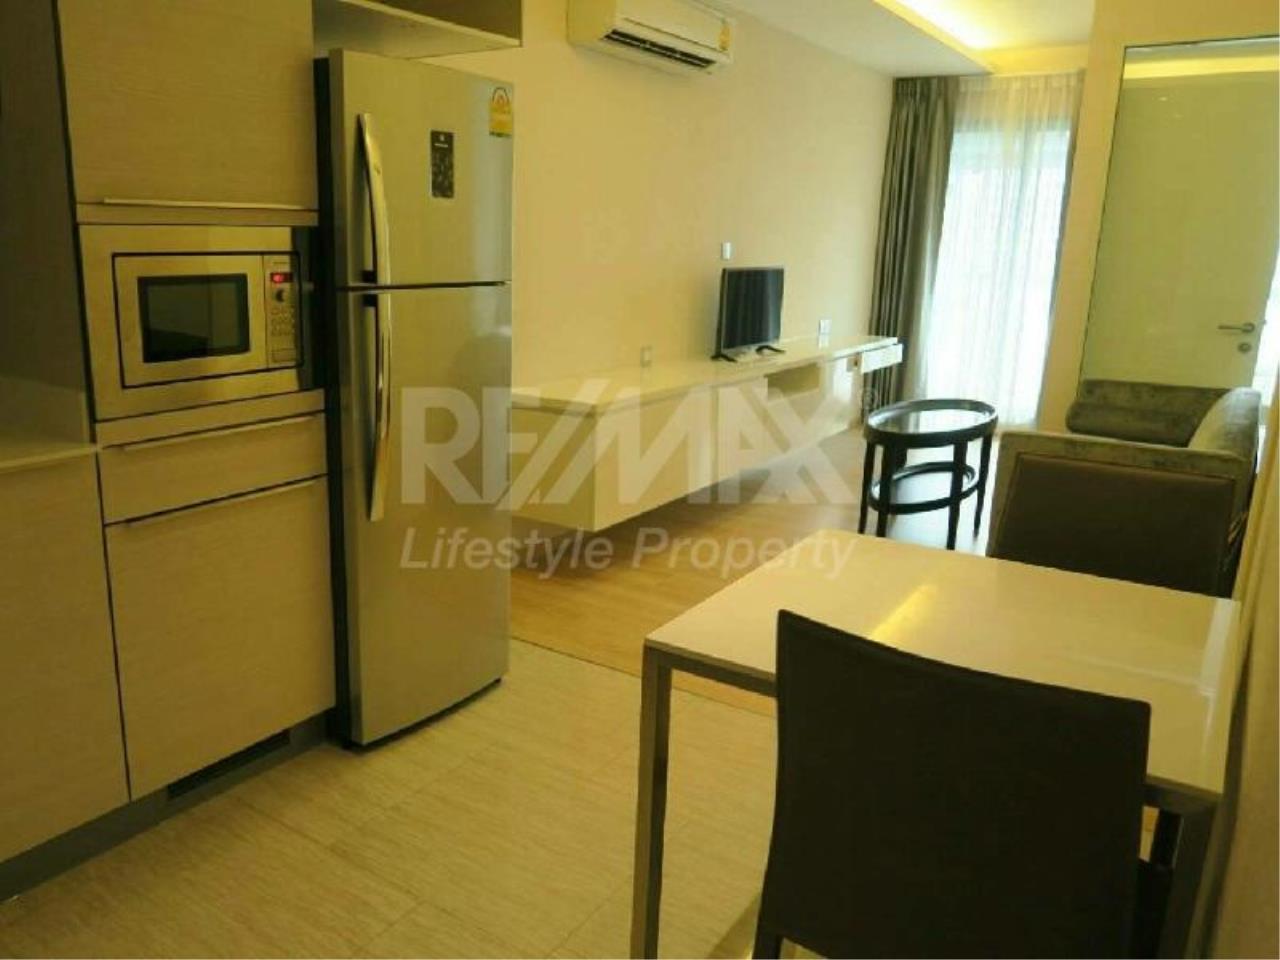 RE/MAX LifeStyle Property Agency's H Sukhumvit 43 2